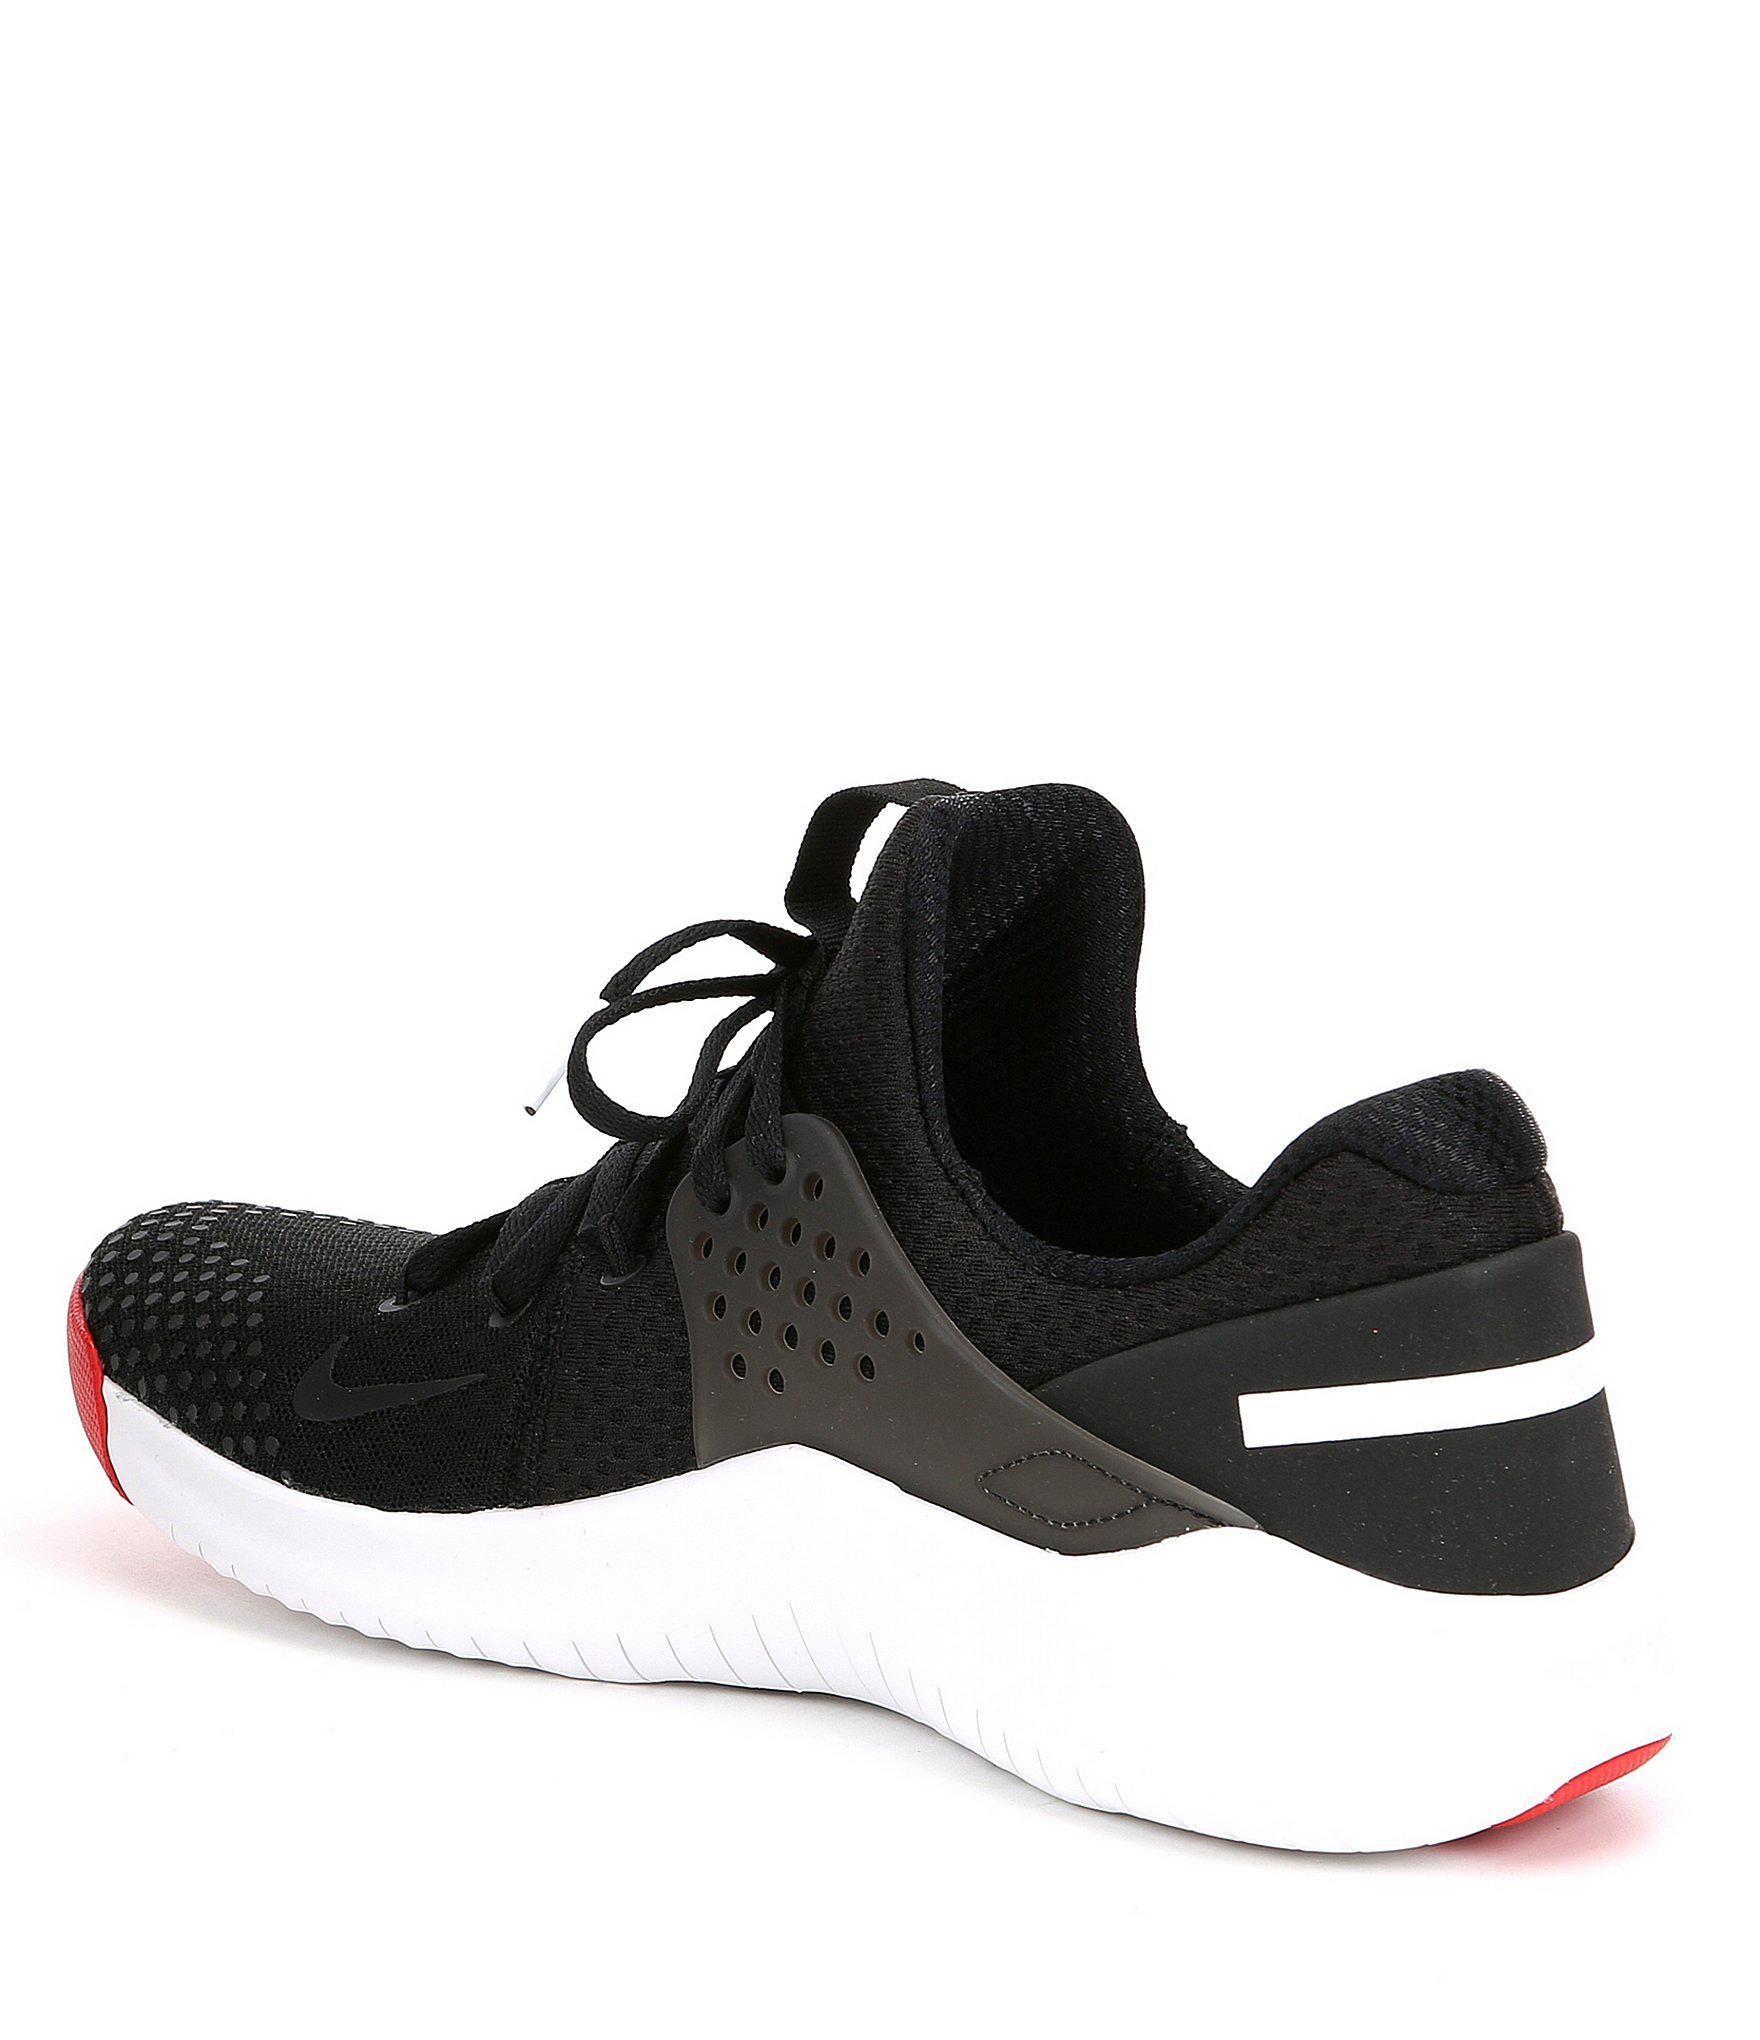 c6f7ddd4b545d Lyst - Nike Men s Free Trainer V8 Training Shoes in Black for Men